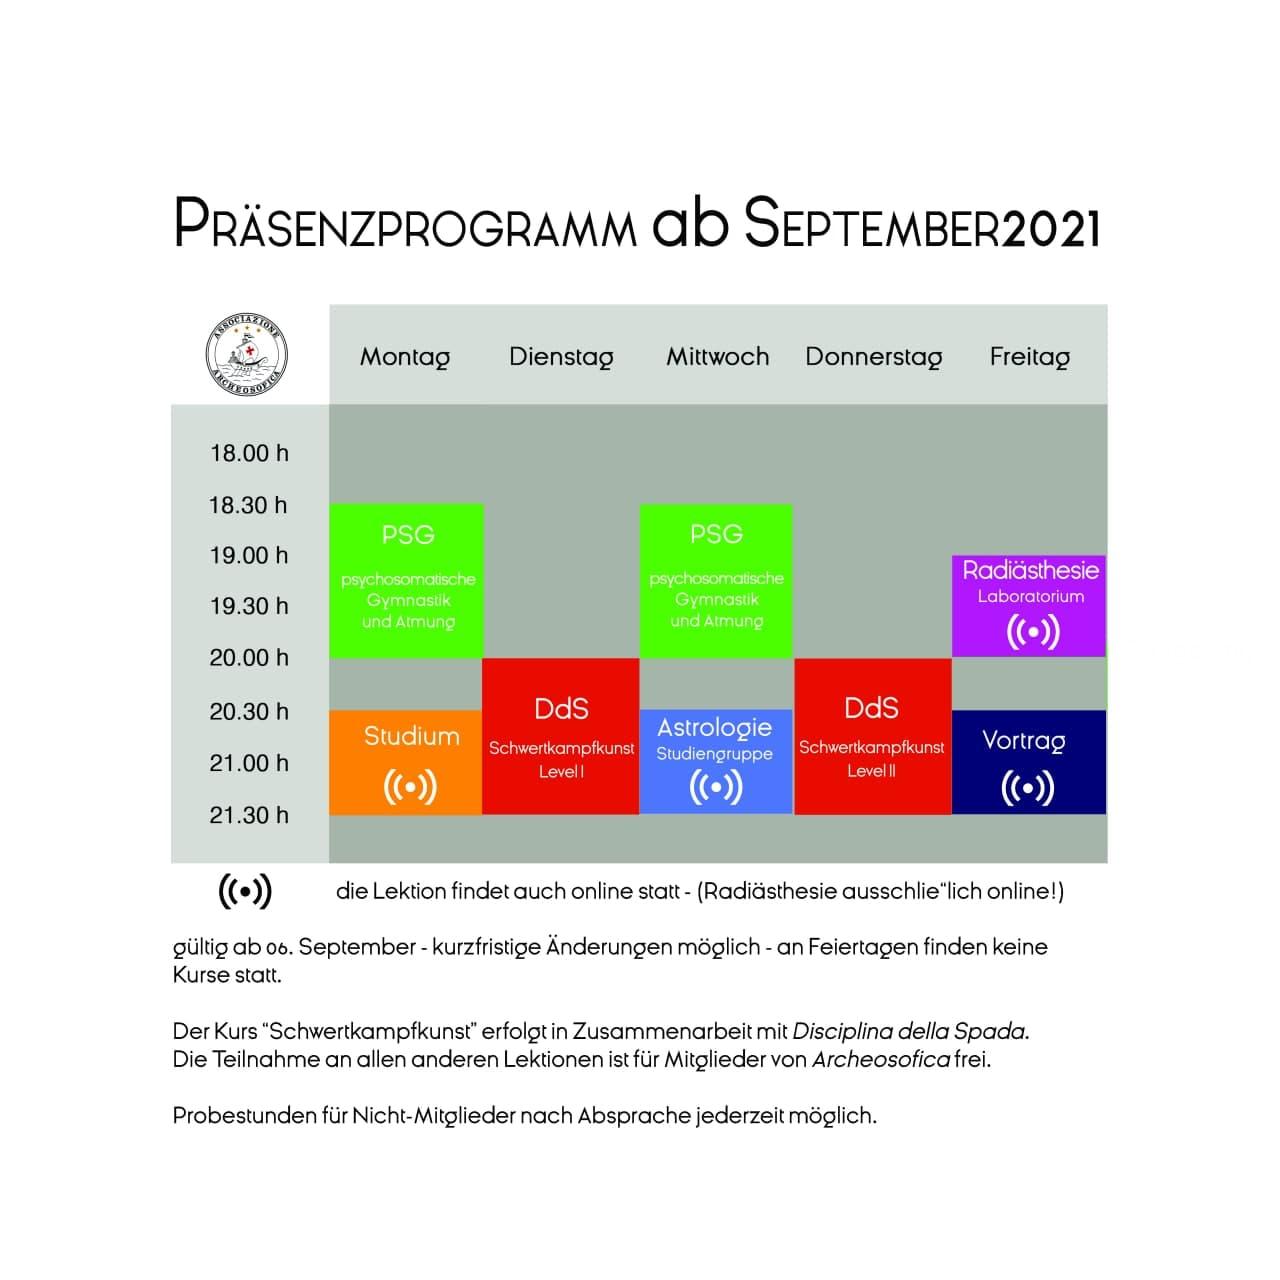 Präsensprogramm ab September 2021